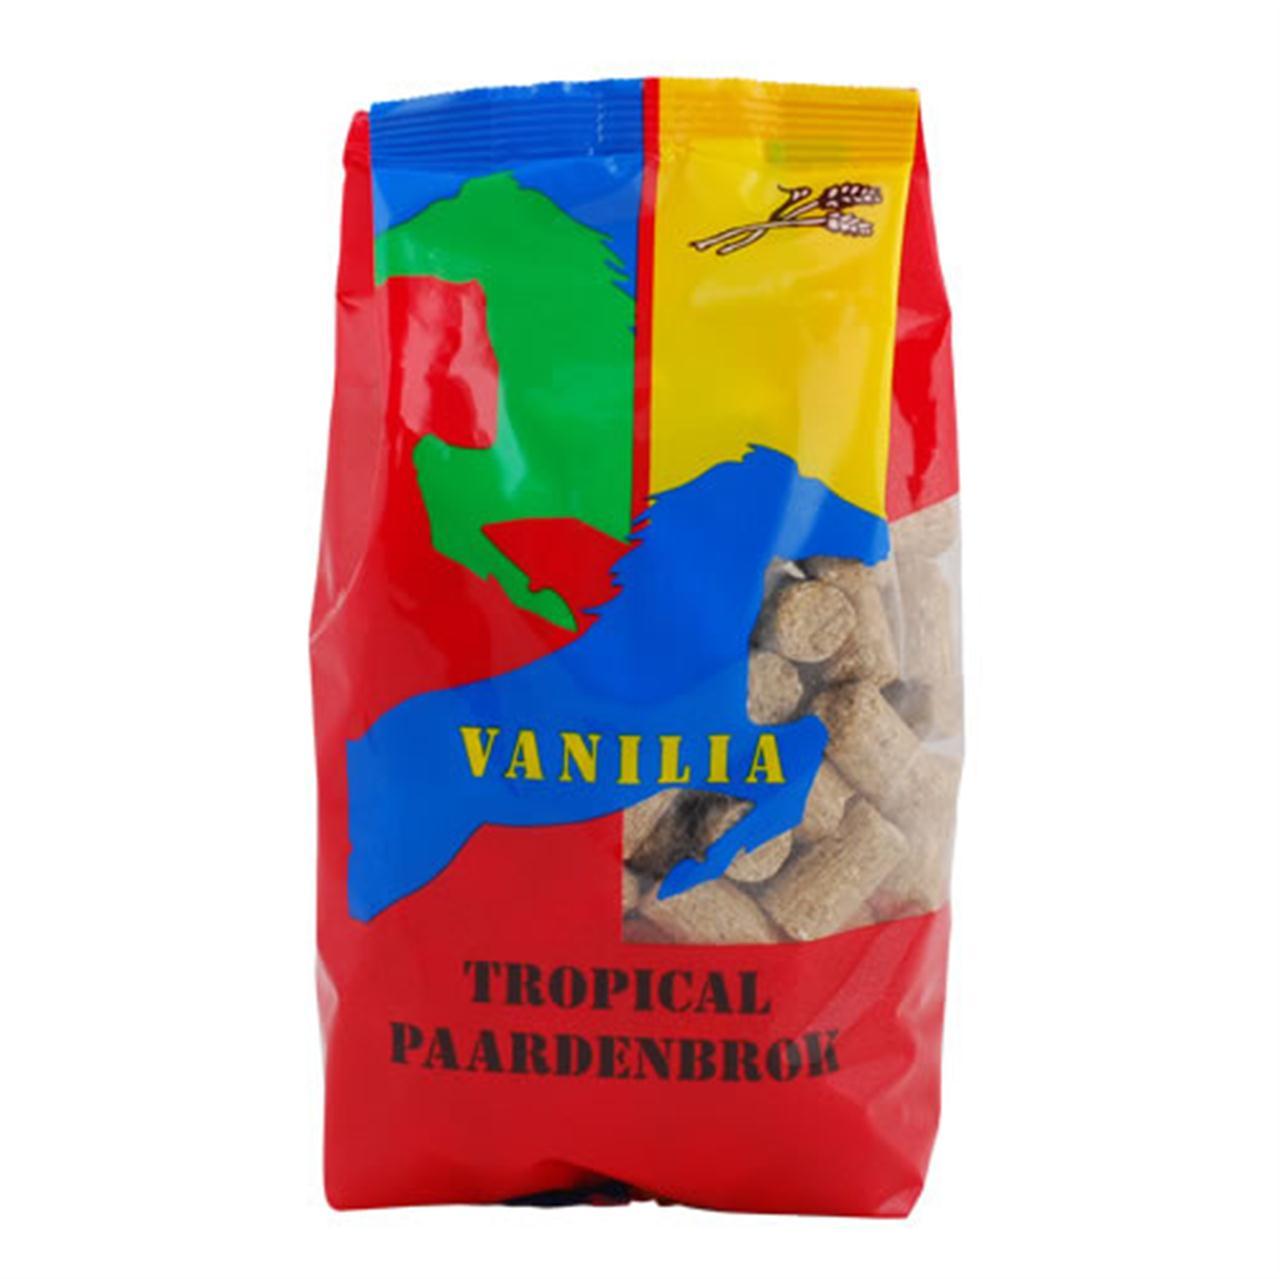 Vanilia Paardenbrok tropical